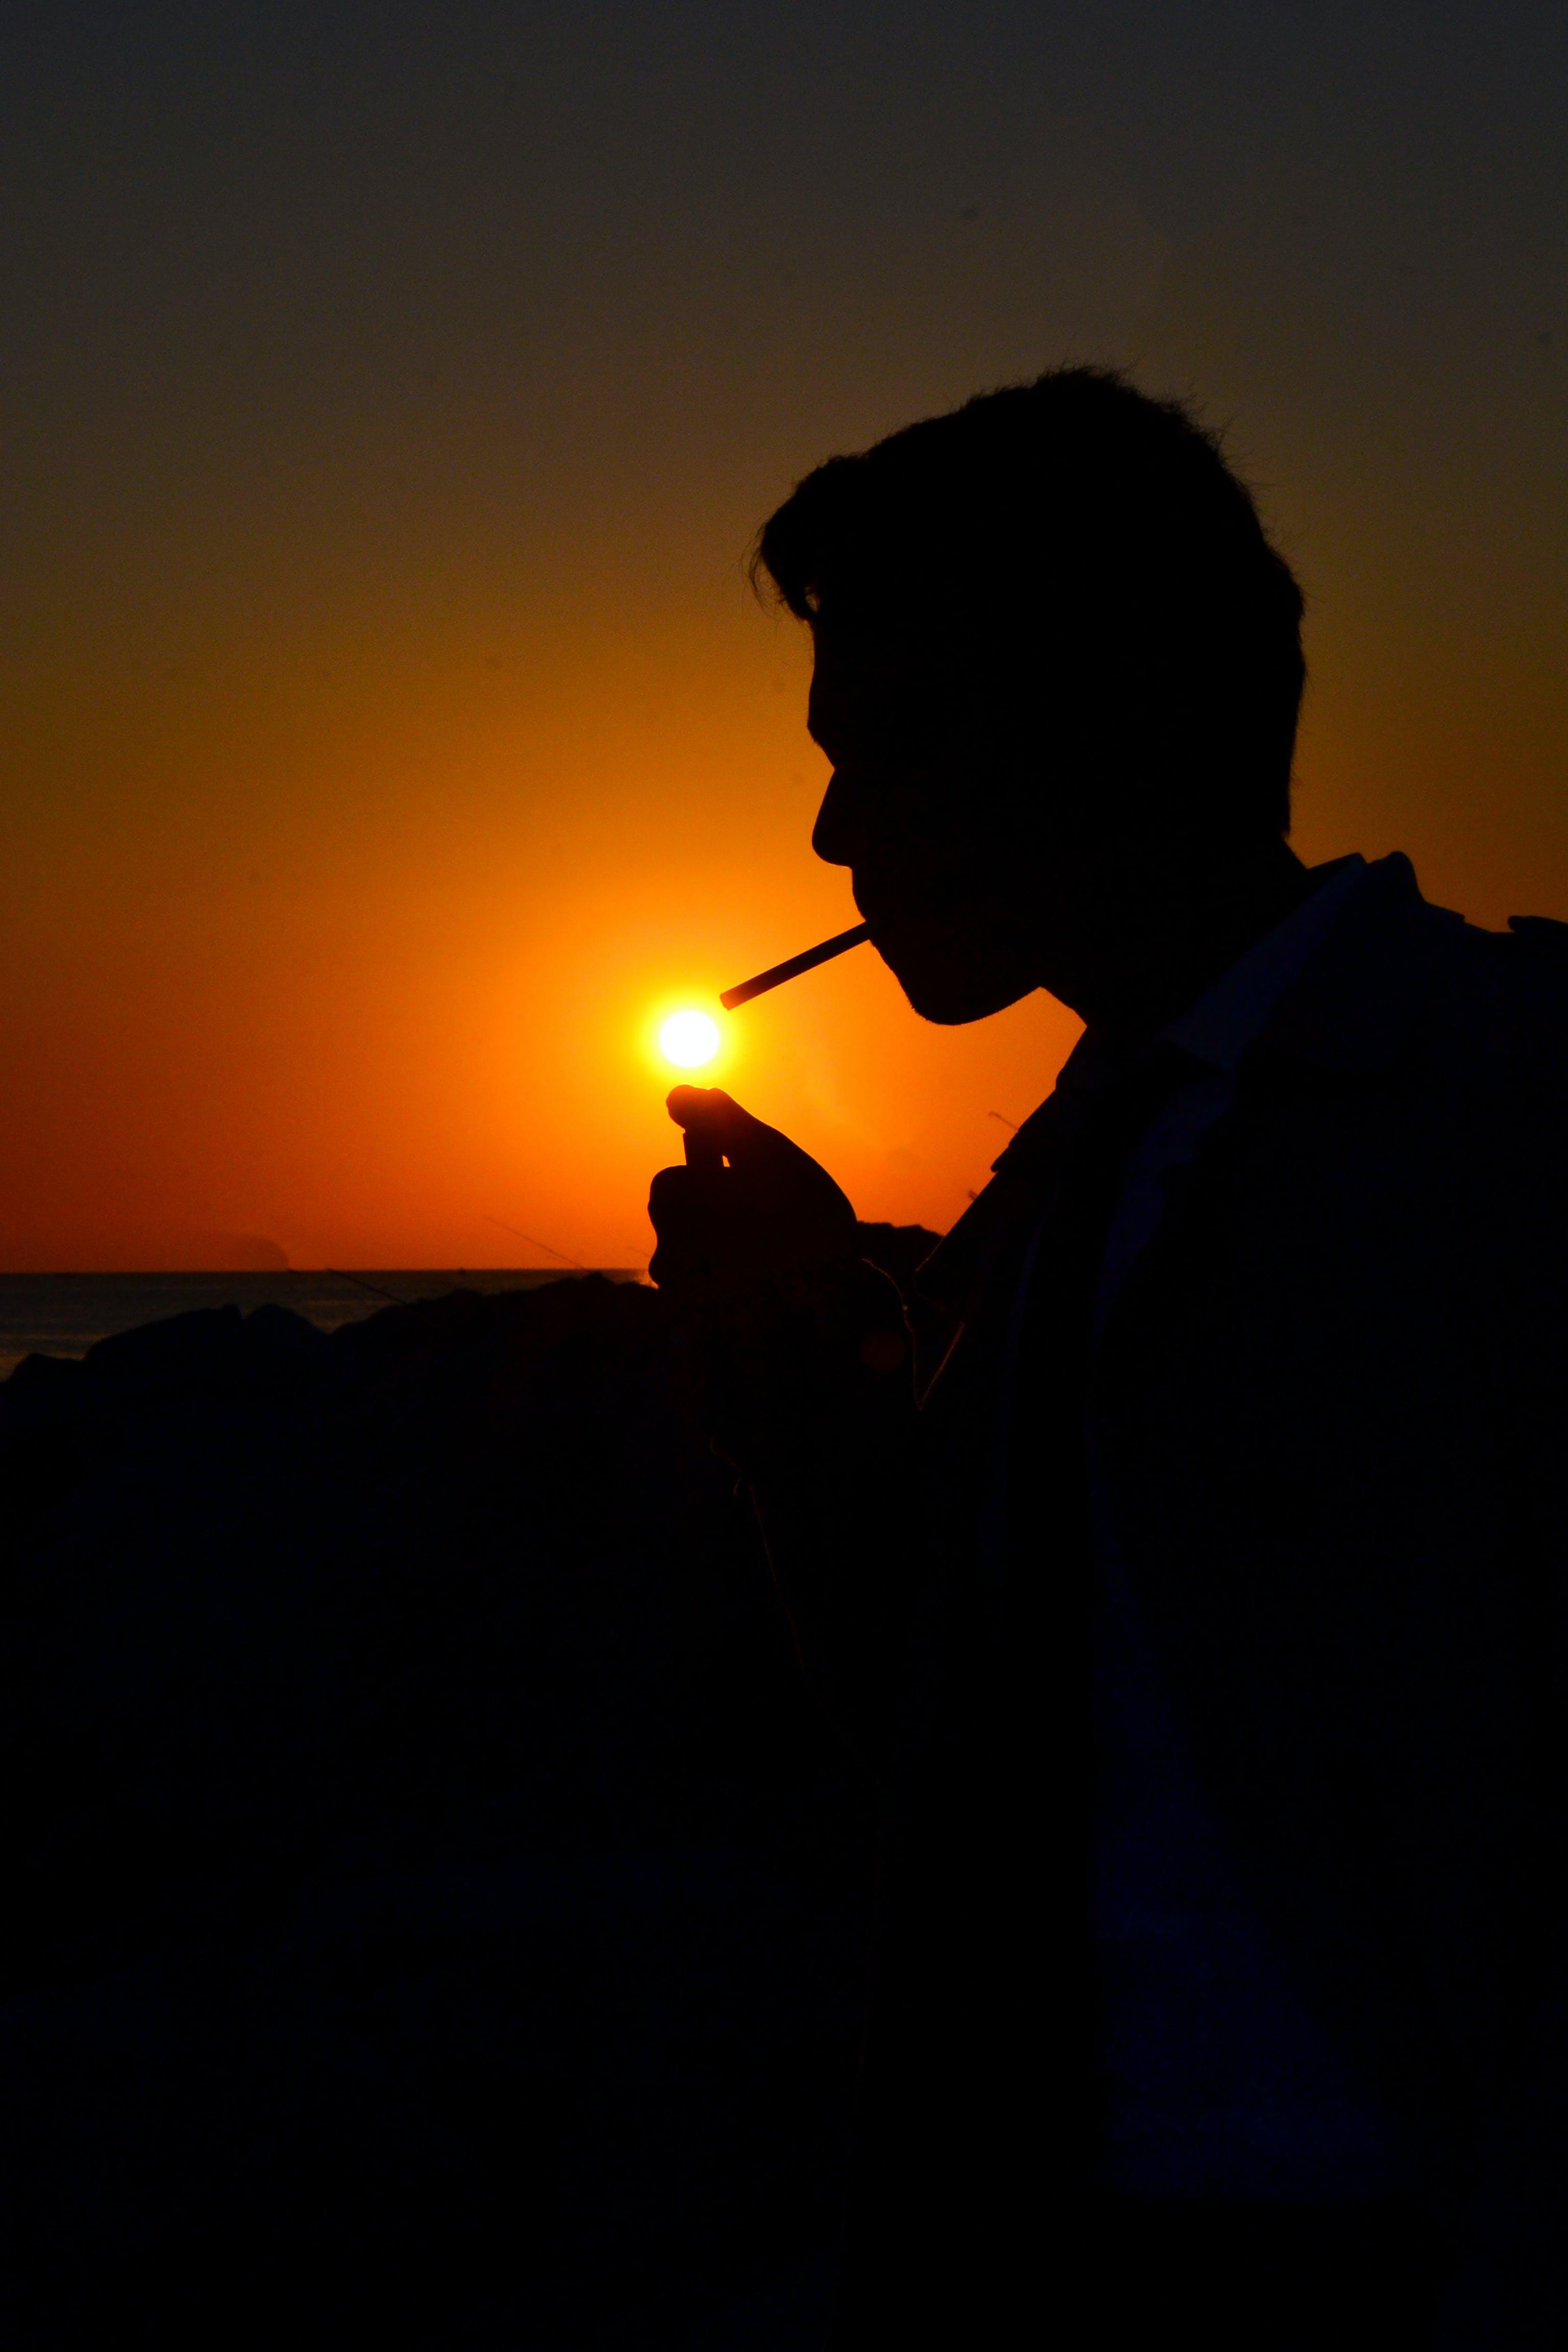 Free stock photo of #sun #photo #shodow #light #yellow #dark #black